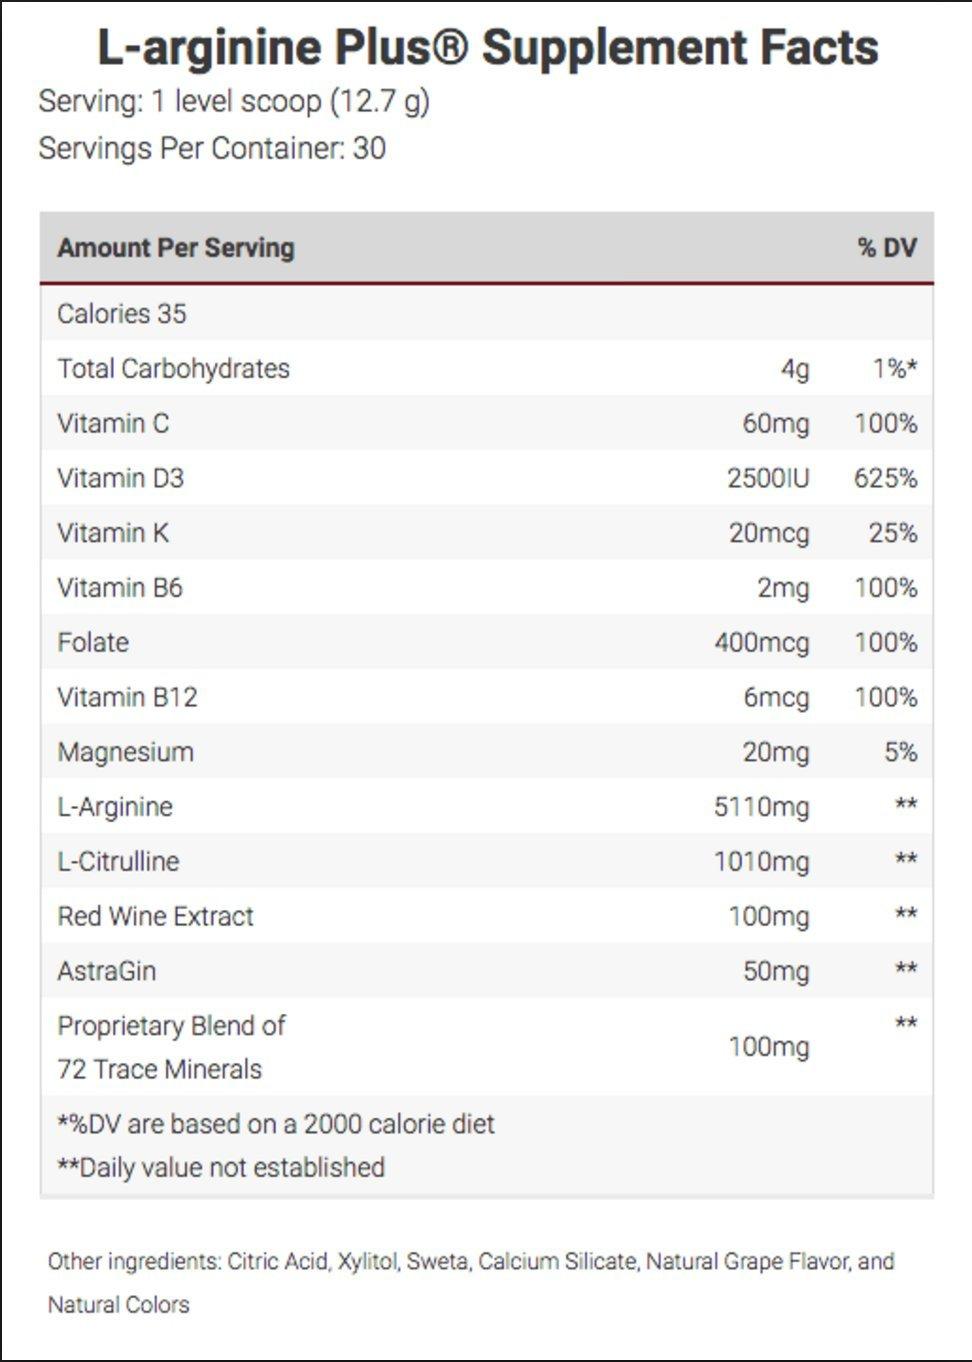 #1 L-Arginine Plus® Official Formula - Raspberry Flavor 3-Pack, Better Blood Pressure, Cholesterol, Energy, Muscle Development & More - #1 L-arginine Supplement - 3 Bottles of Popular Raspberry Flavor by Elements of Health Care